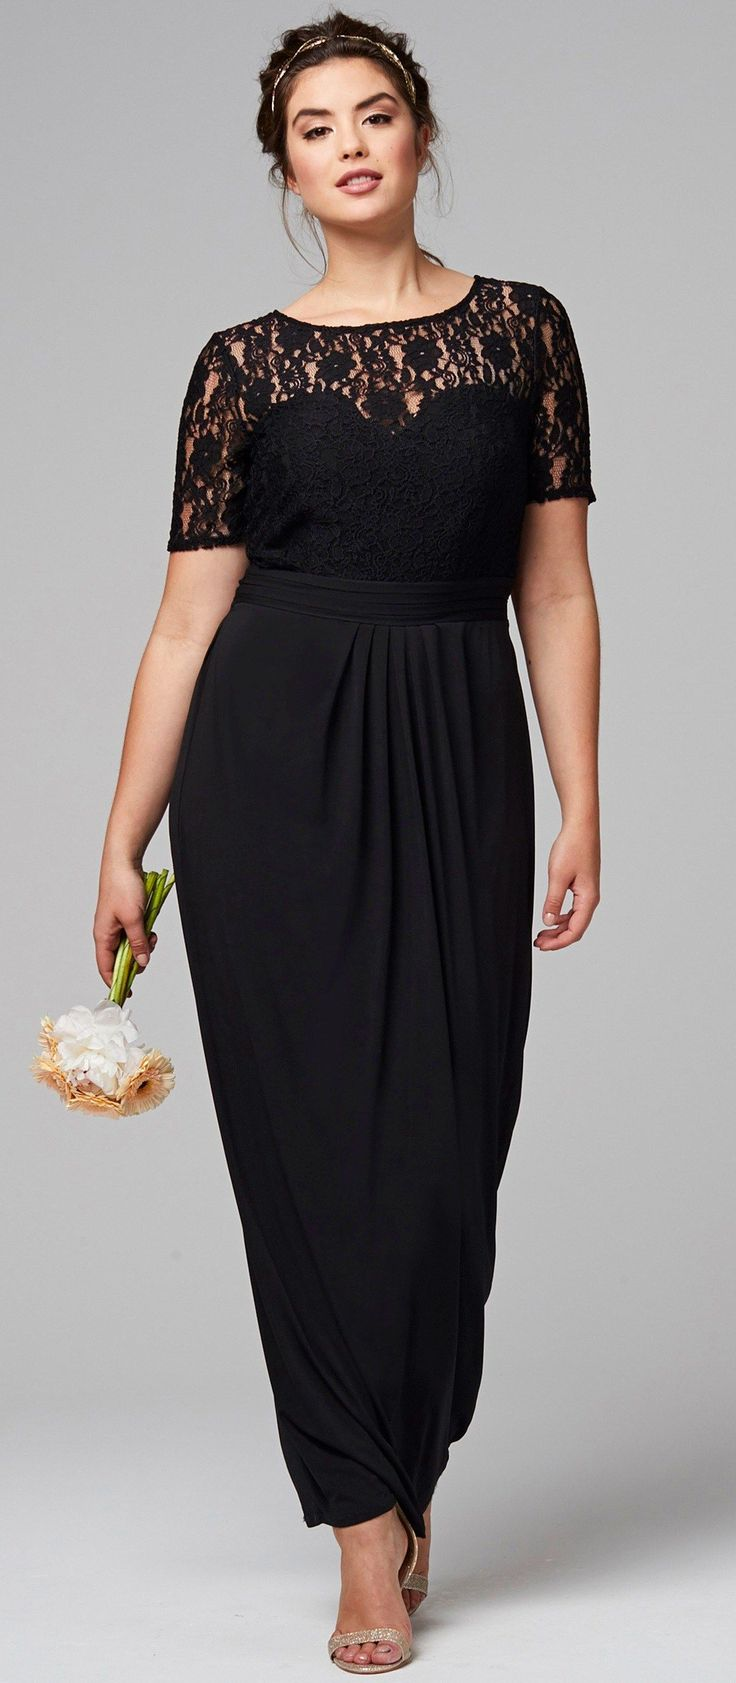 44 best Bridal images on Pinterest   Homecoming dresses straps ...